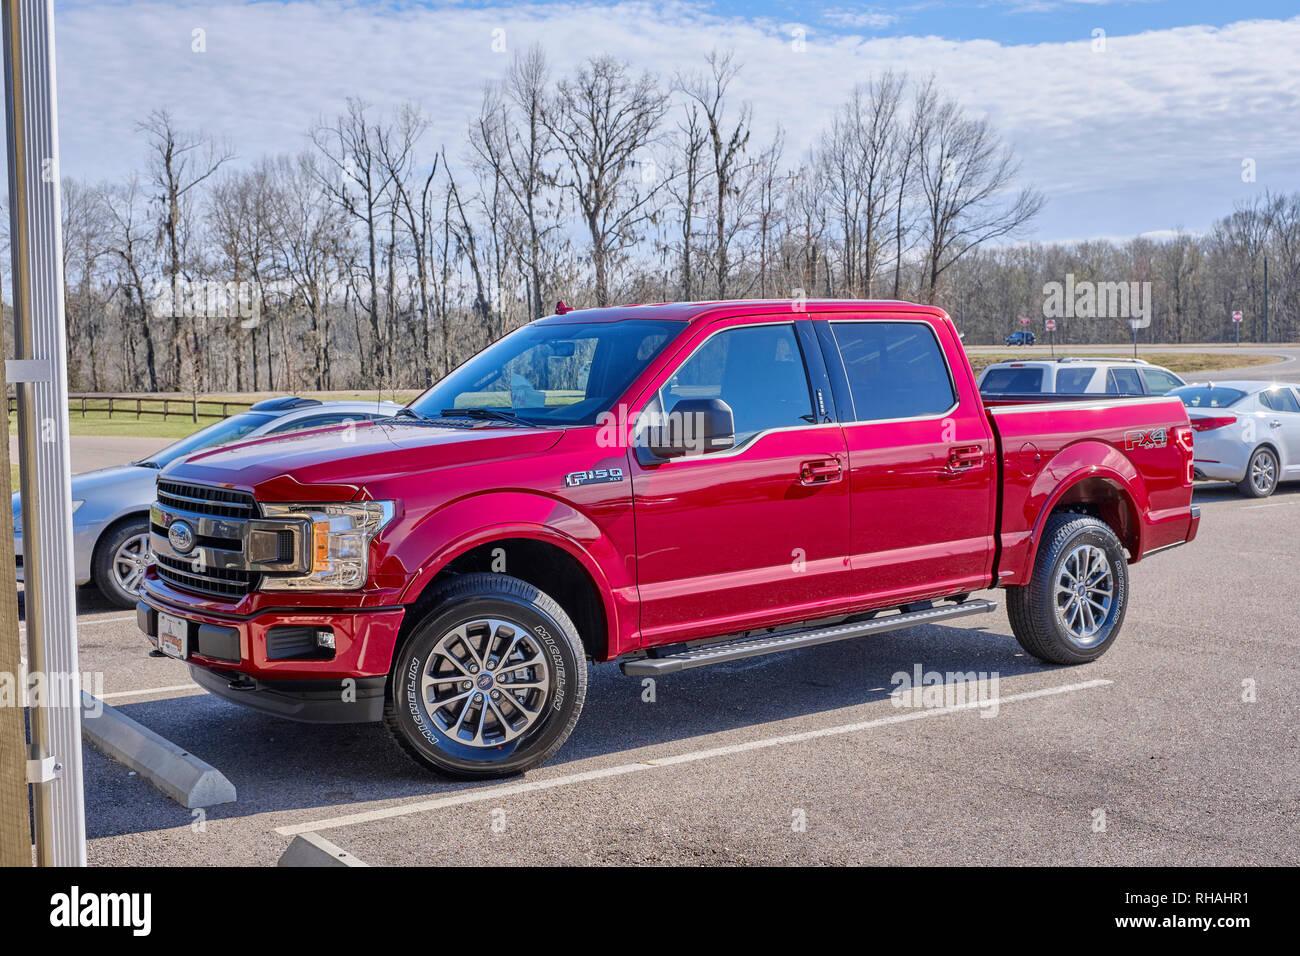 Ford F150 Pick Up Truck Fotos E Imagenes De Stock Alamy